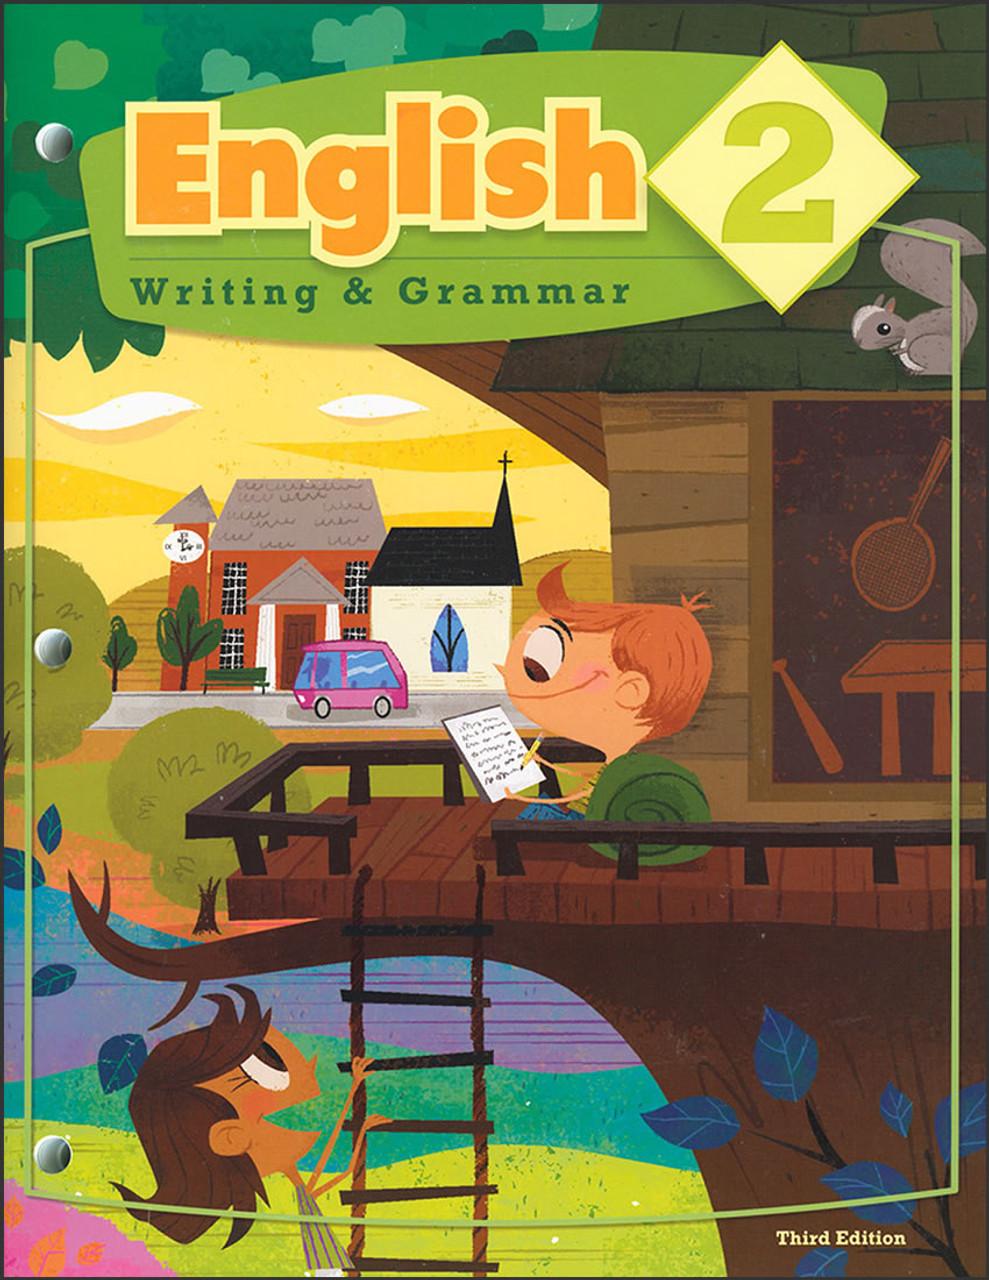 English 2, 3rd edition